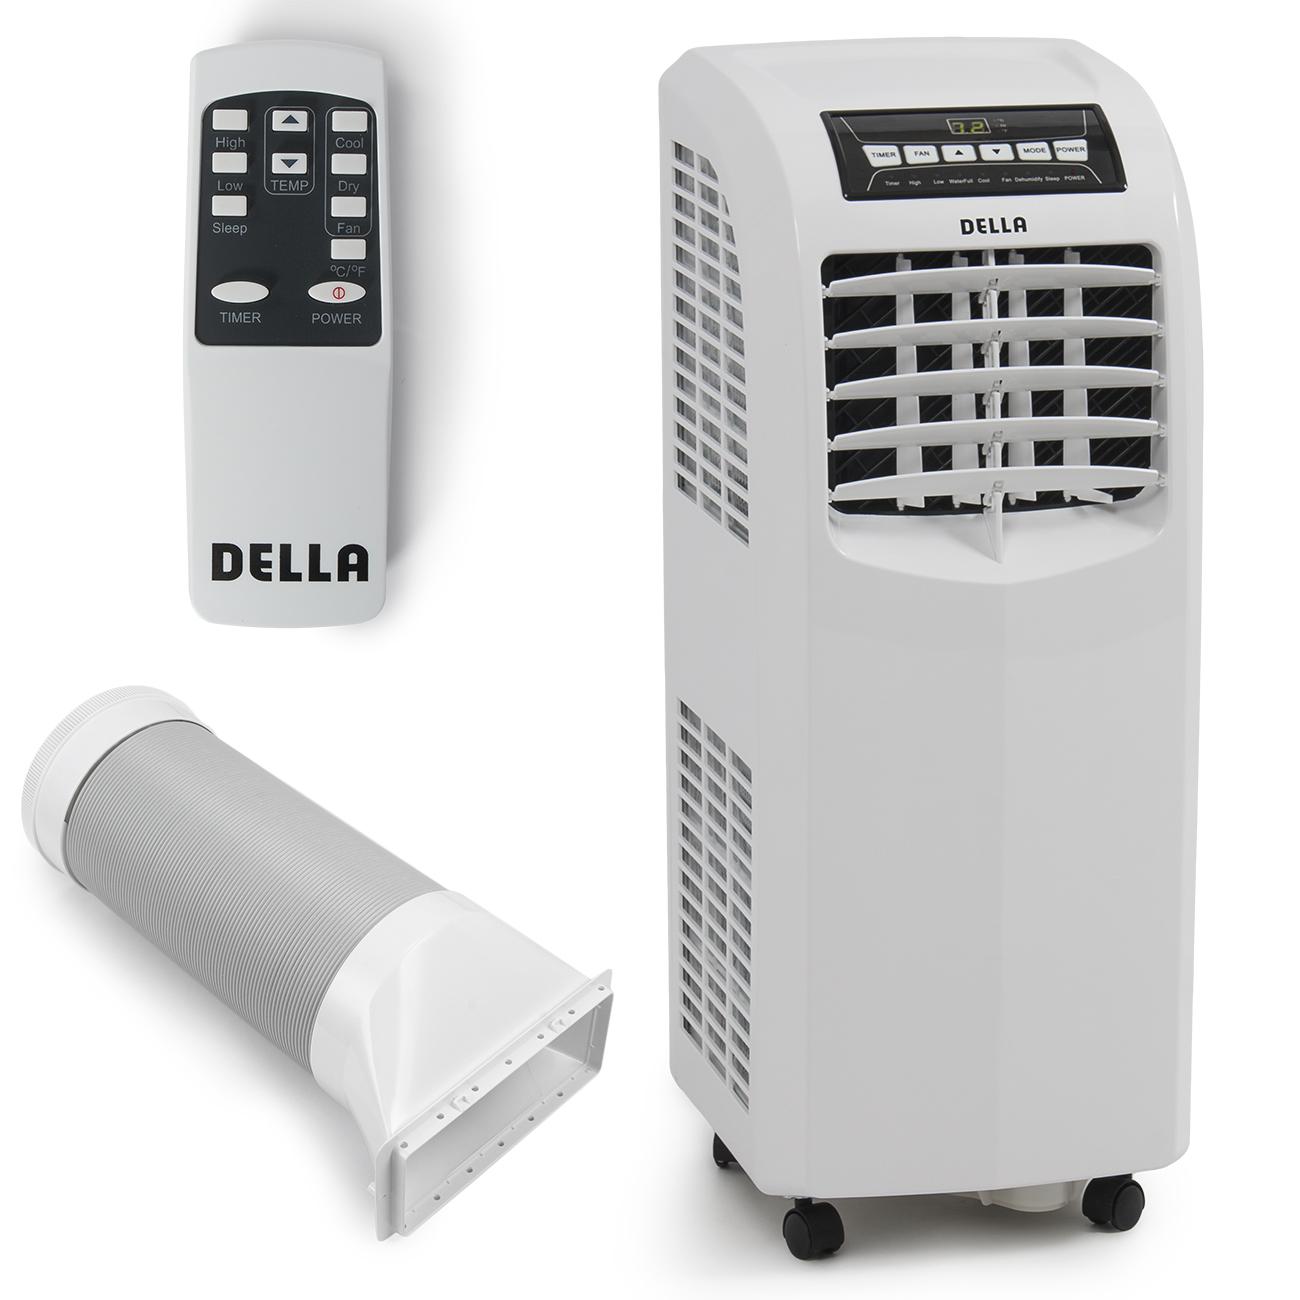 8000 Btu Window Air Conditioner Della 8,000 BTU Portable Air Conditioner Cooling Fan ...